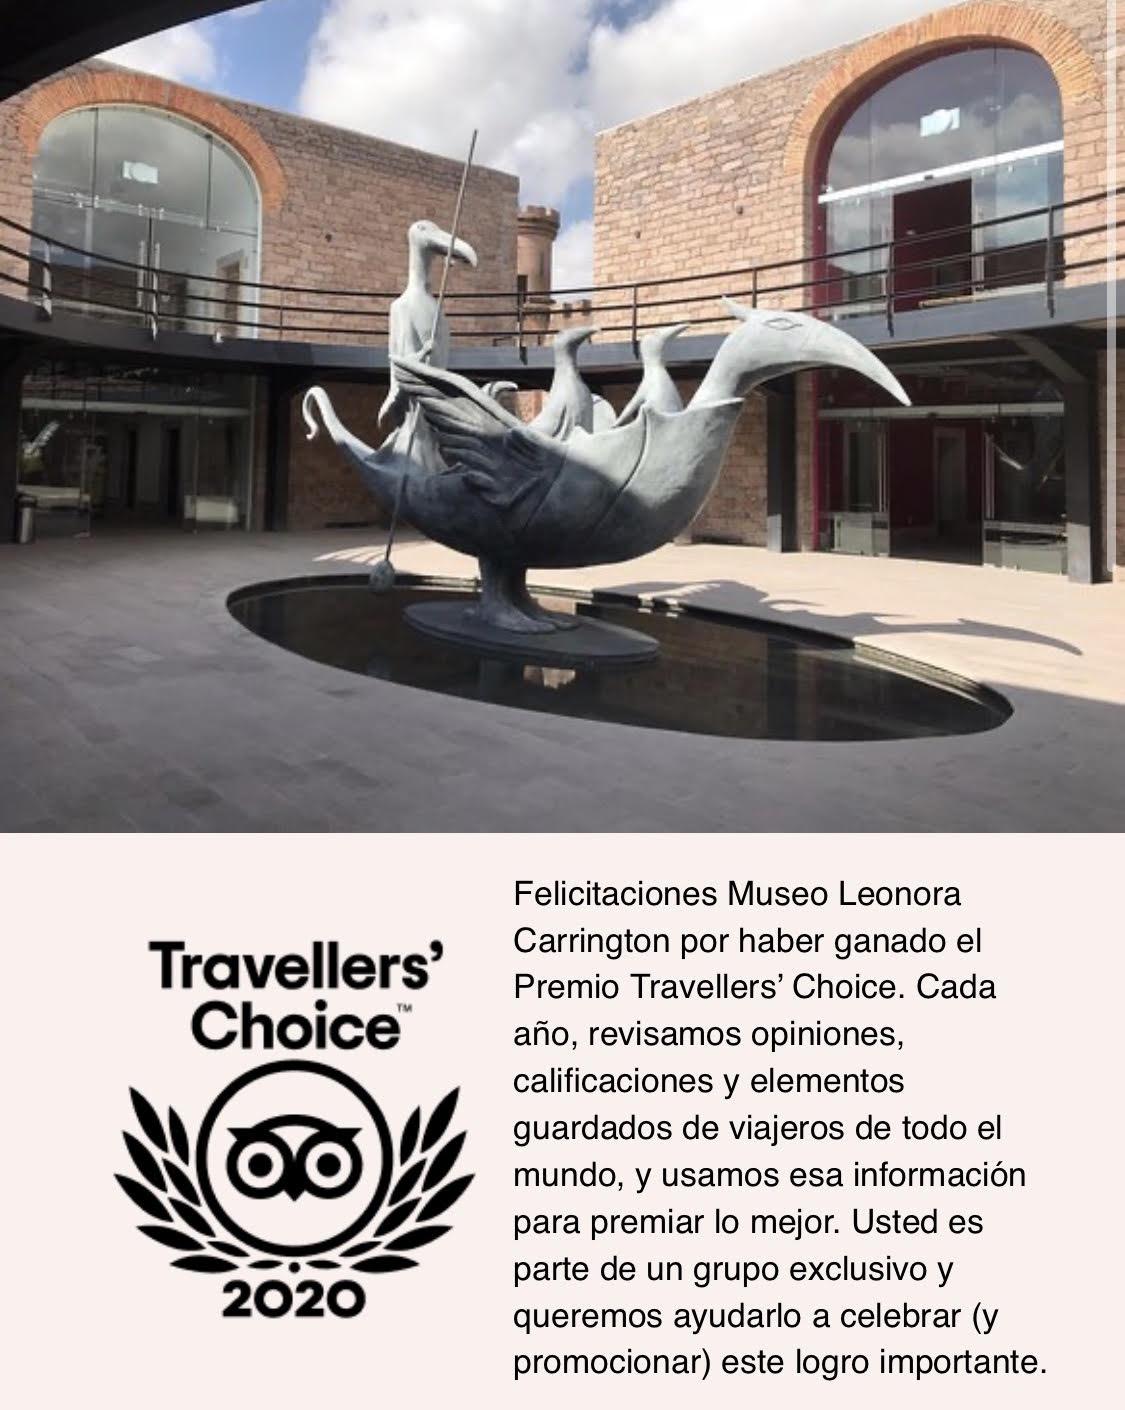 Traveler´s Choice 2020 al Museo Leonora Carrington SLP